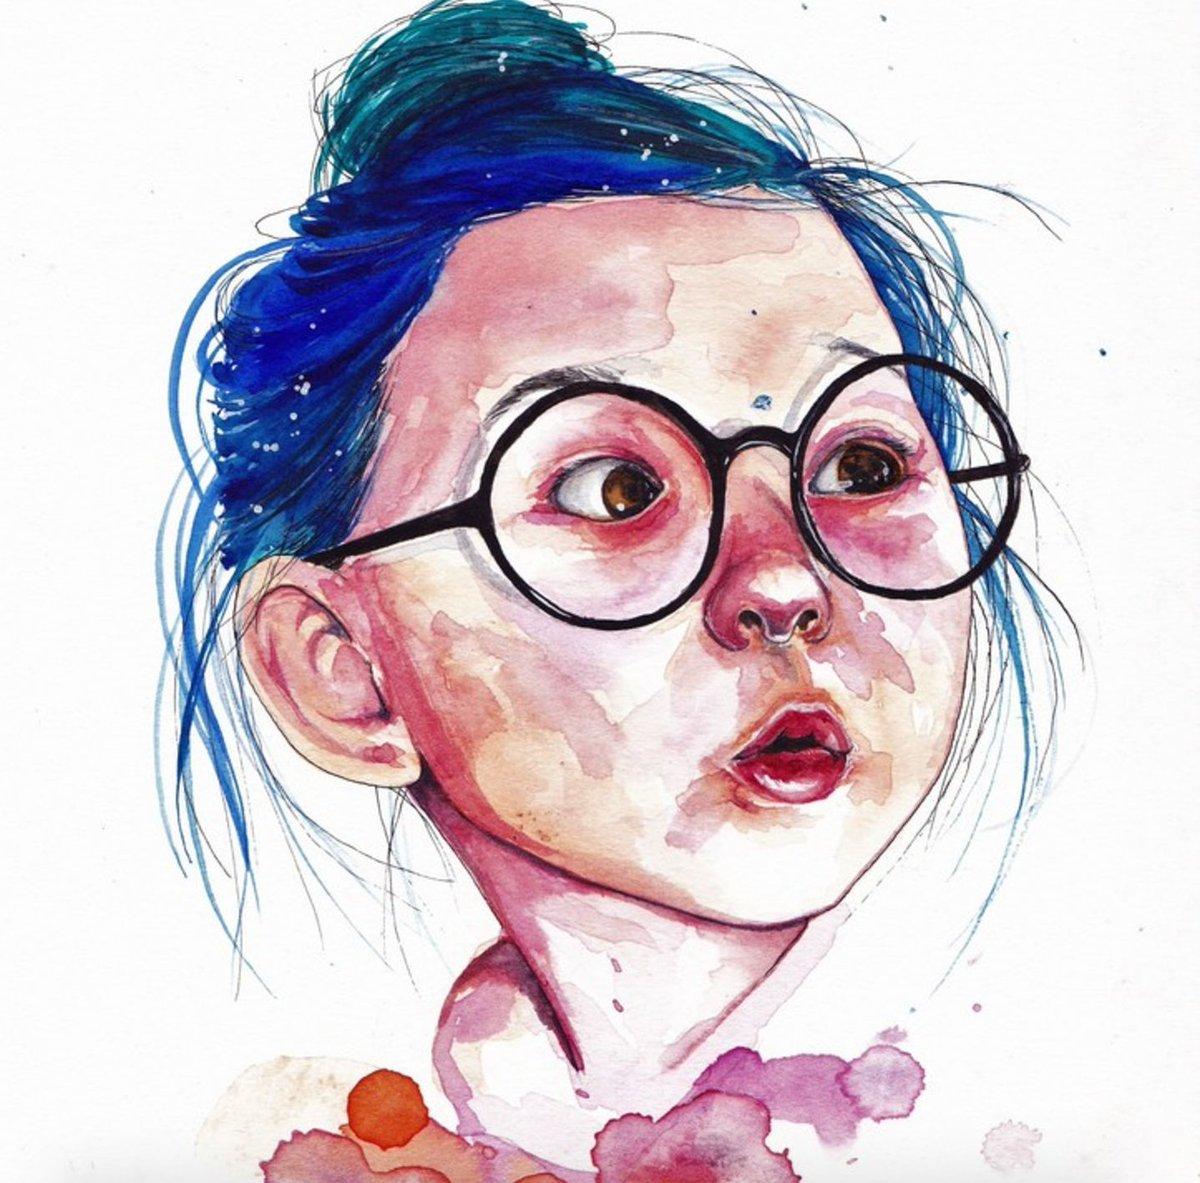 Kids say some weird shit... https://t.co/5aXvKiViEK https://t.co/gKHaMQAzjD